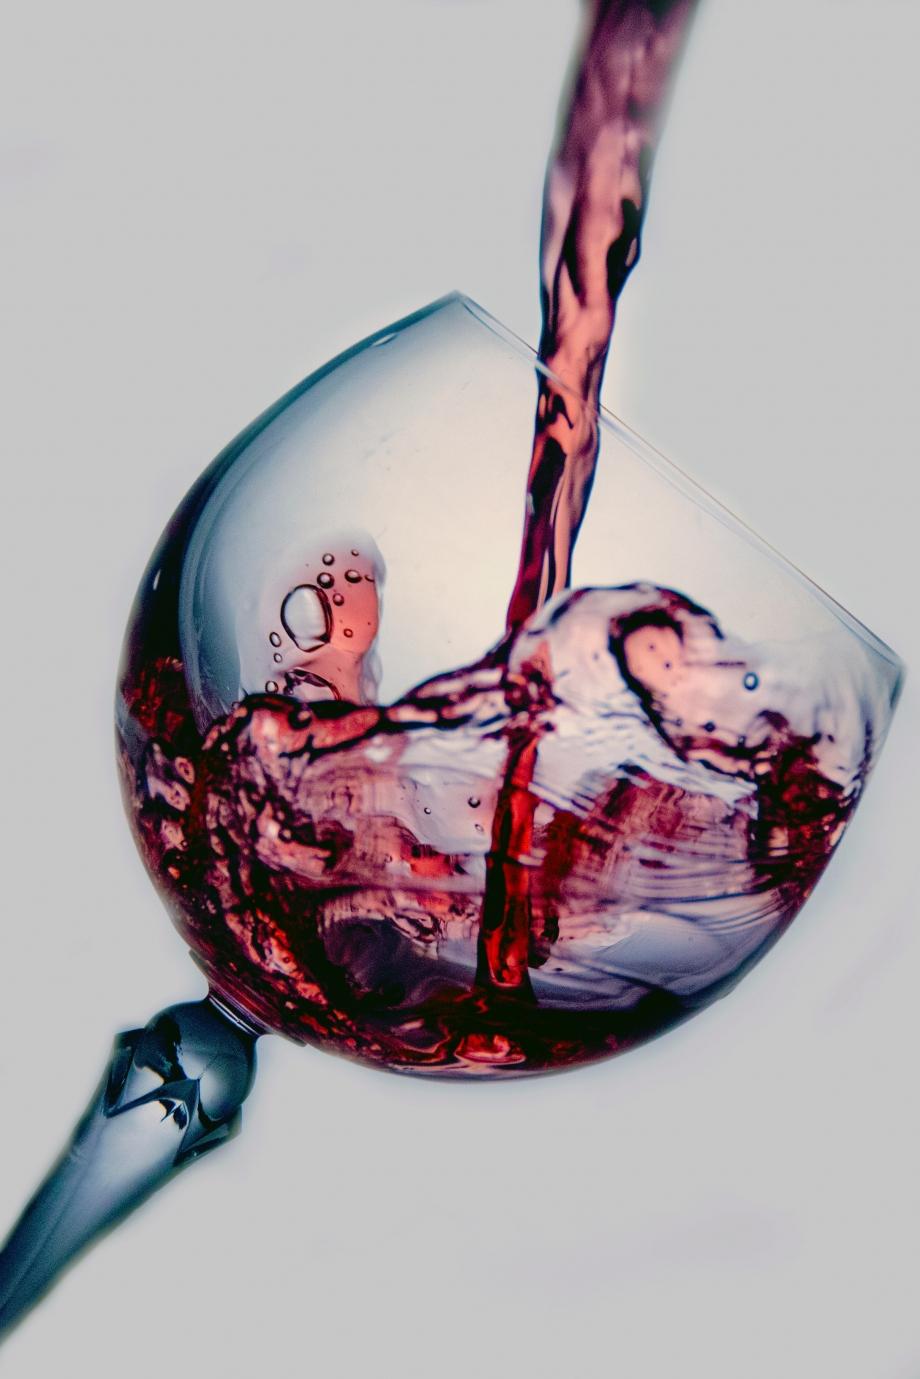 AlgarveCool_Blog_Vale do Lobo Wine Connection Tasting Experience